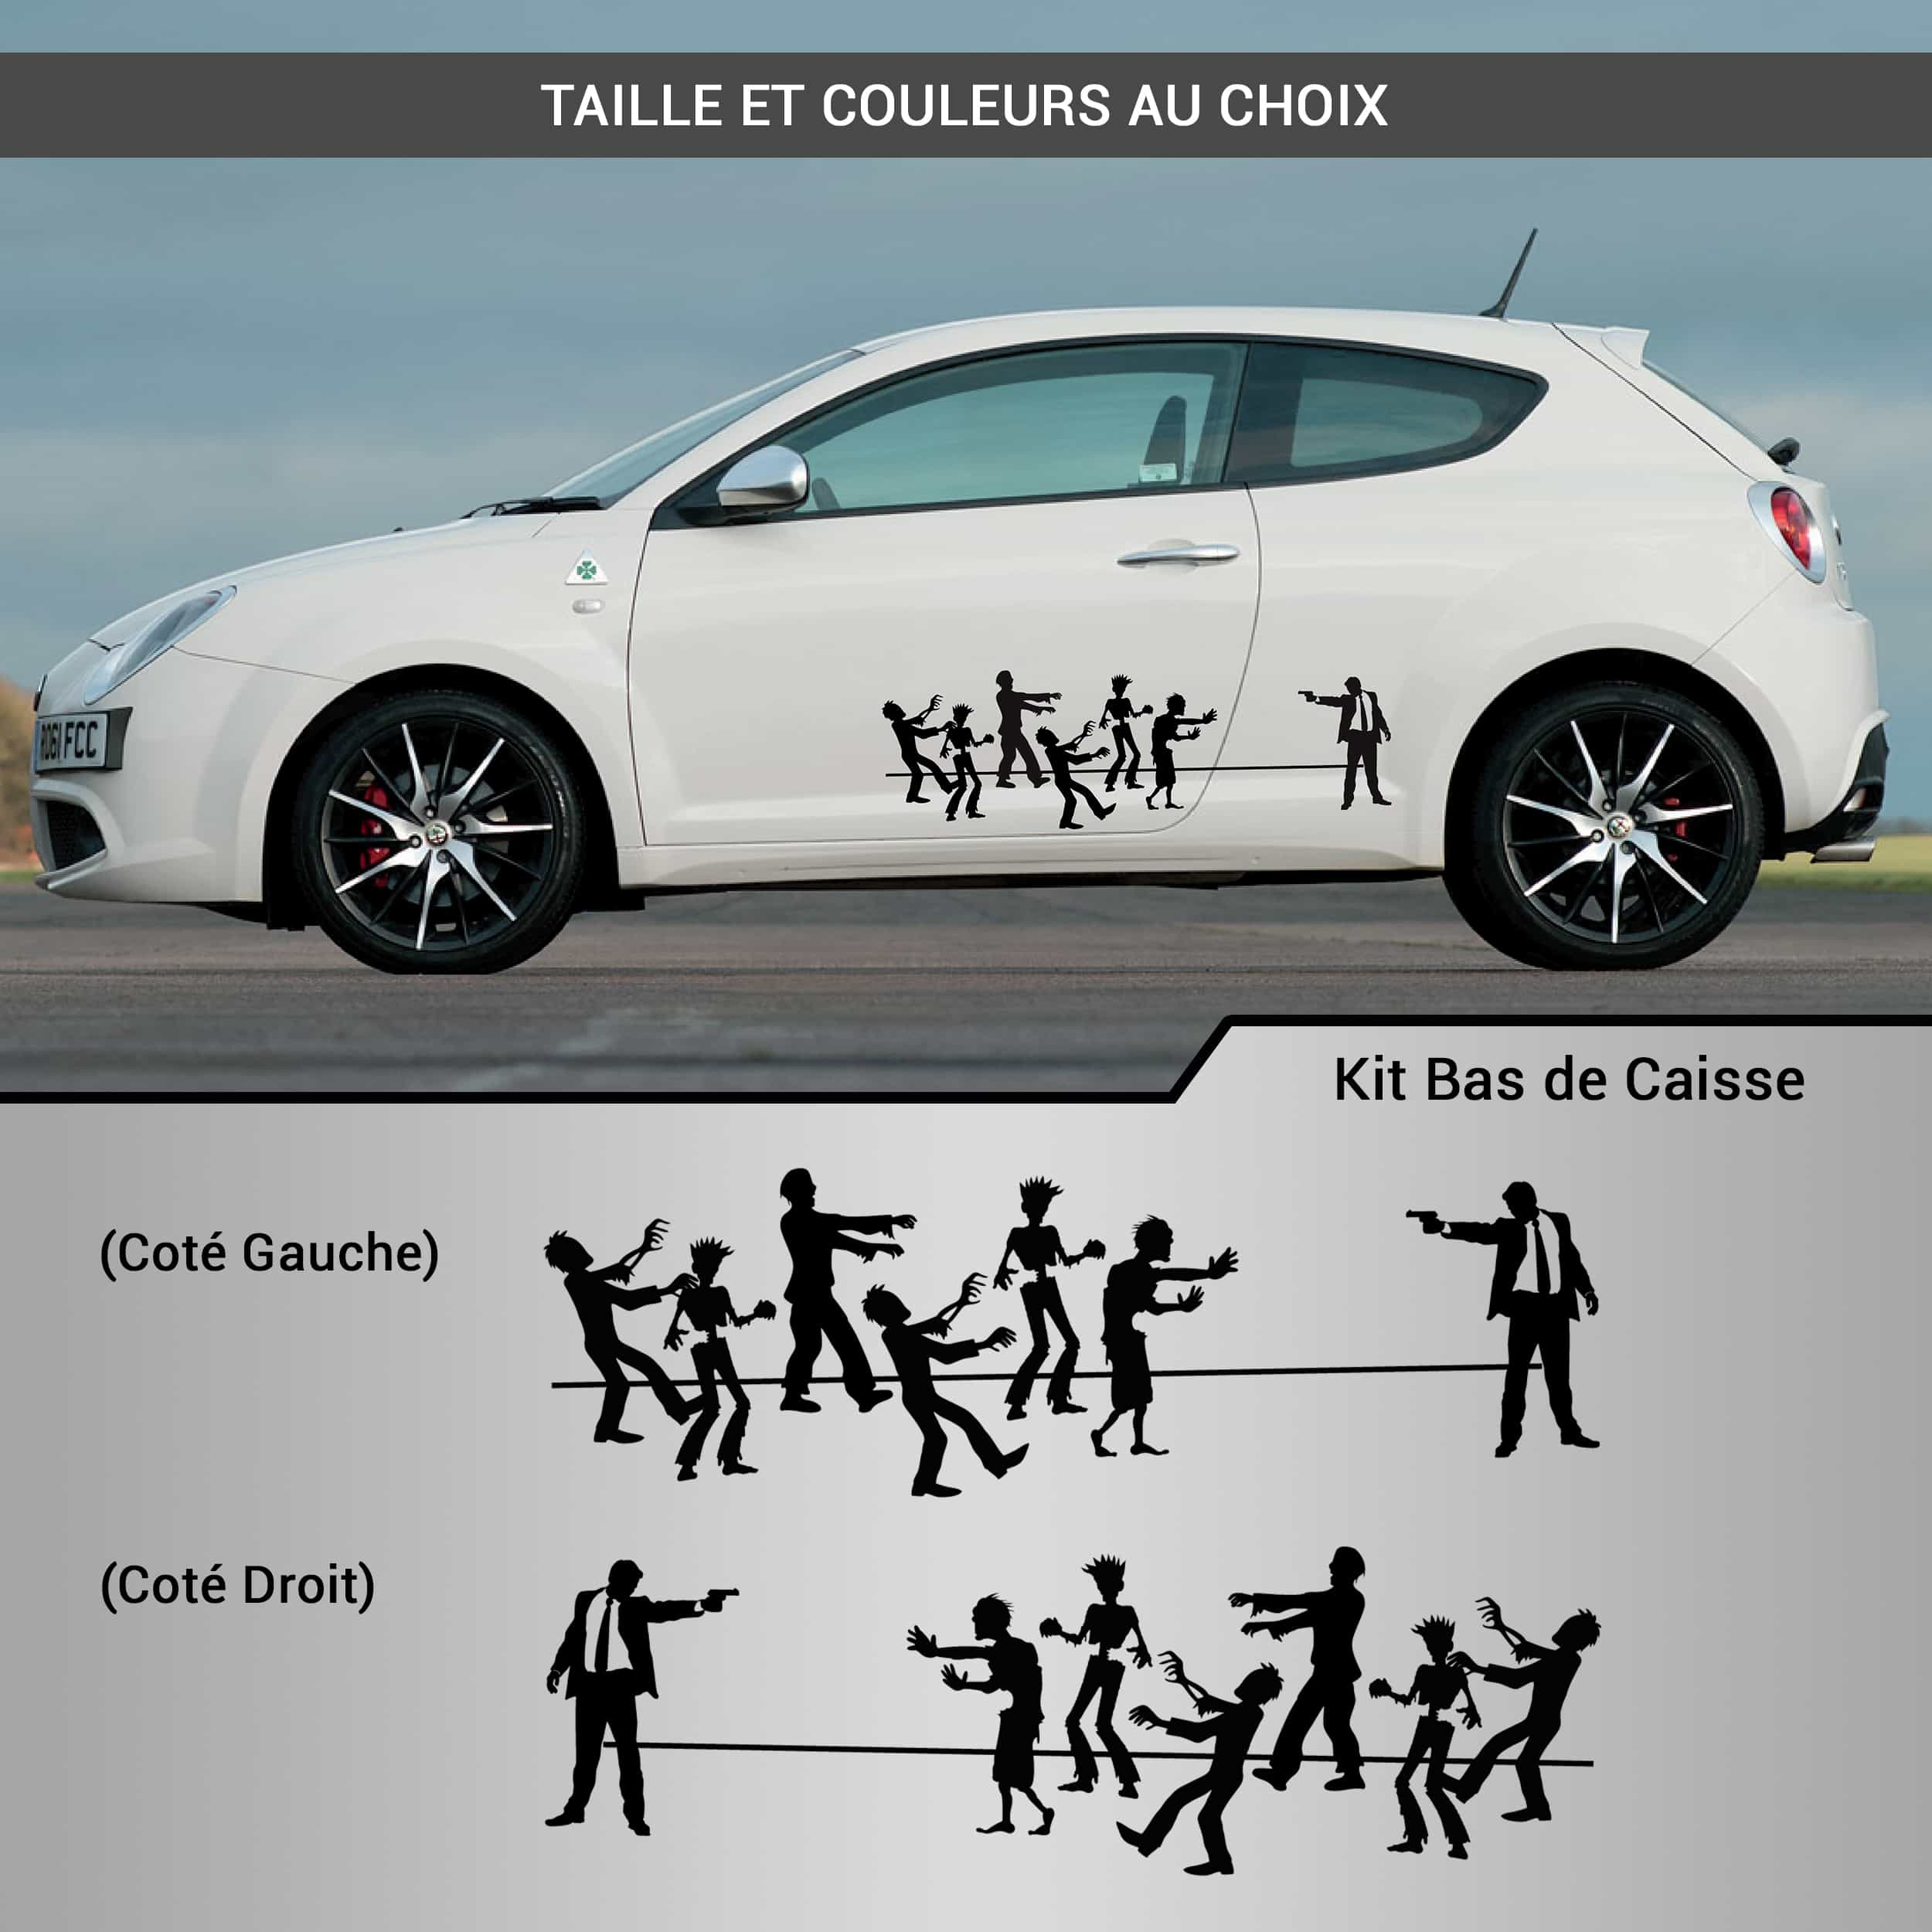 kit-stickers-deco-voiture-zombie-ref1-racing-autocollant-bas-de-caisse-tuning-sticker-bandes-sport-autocollants-rallye-min